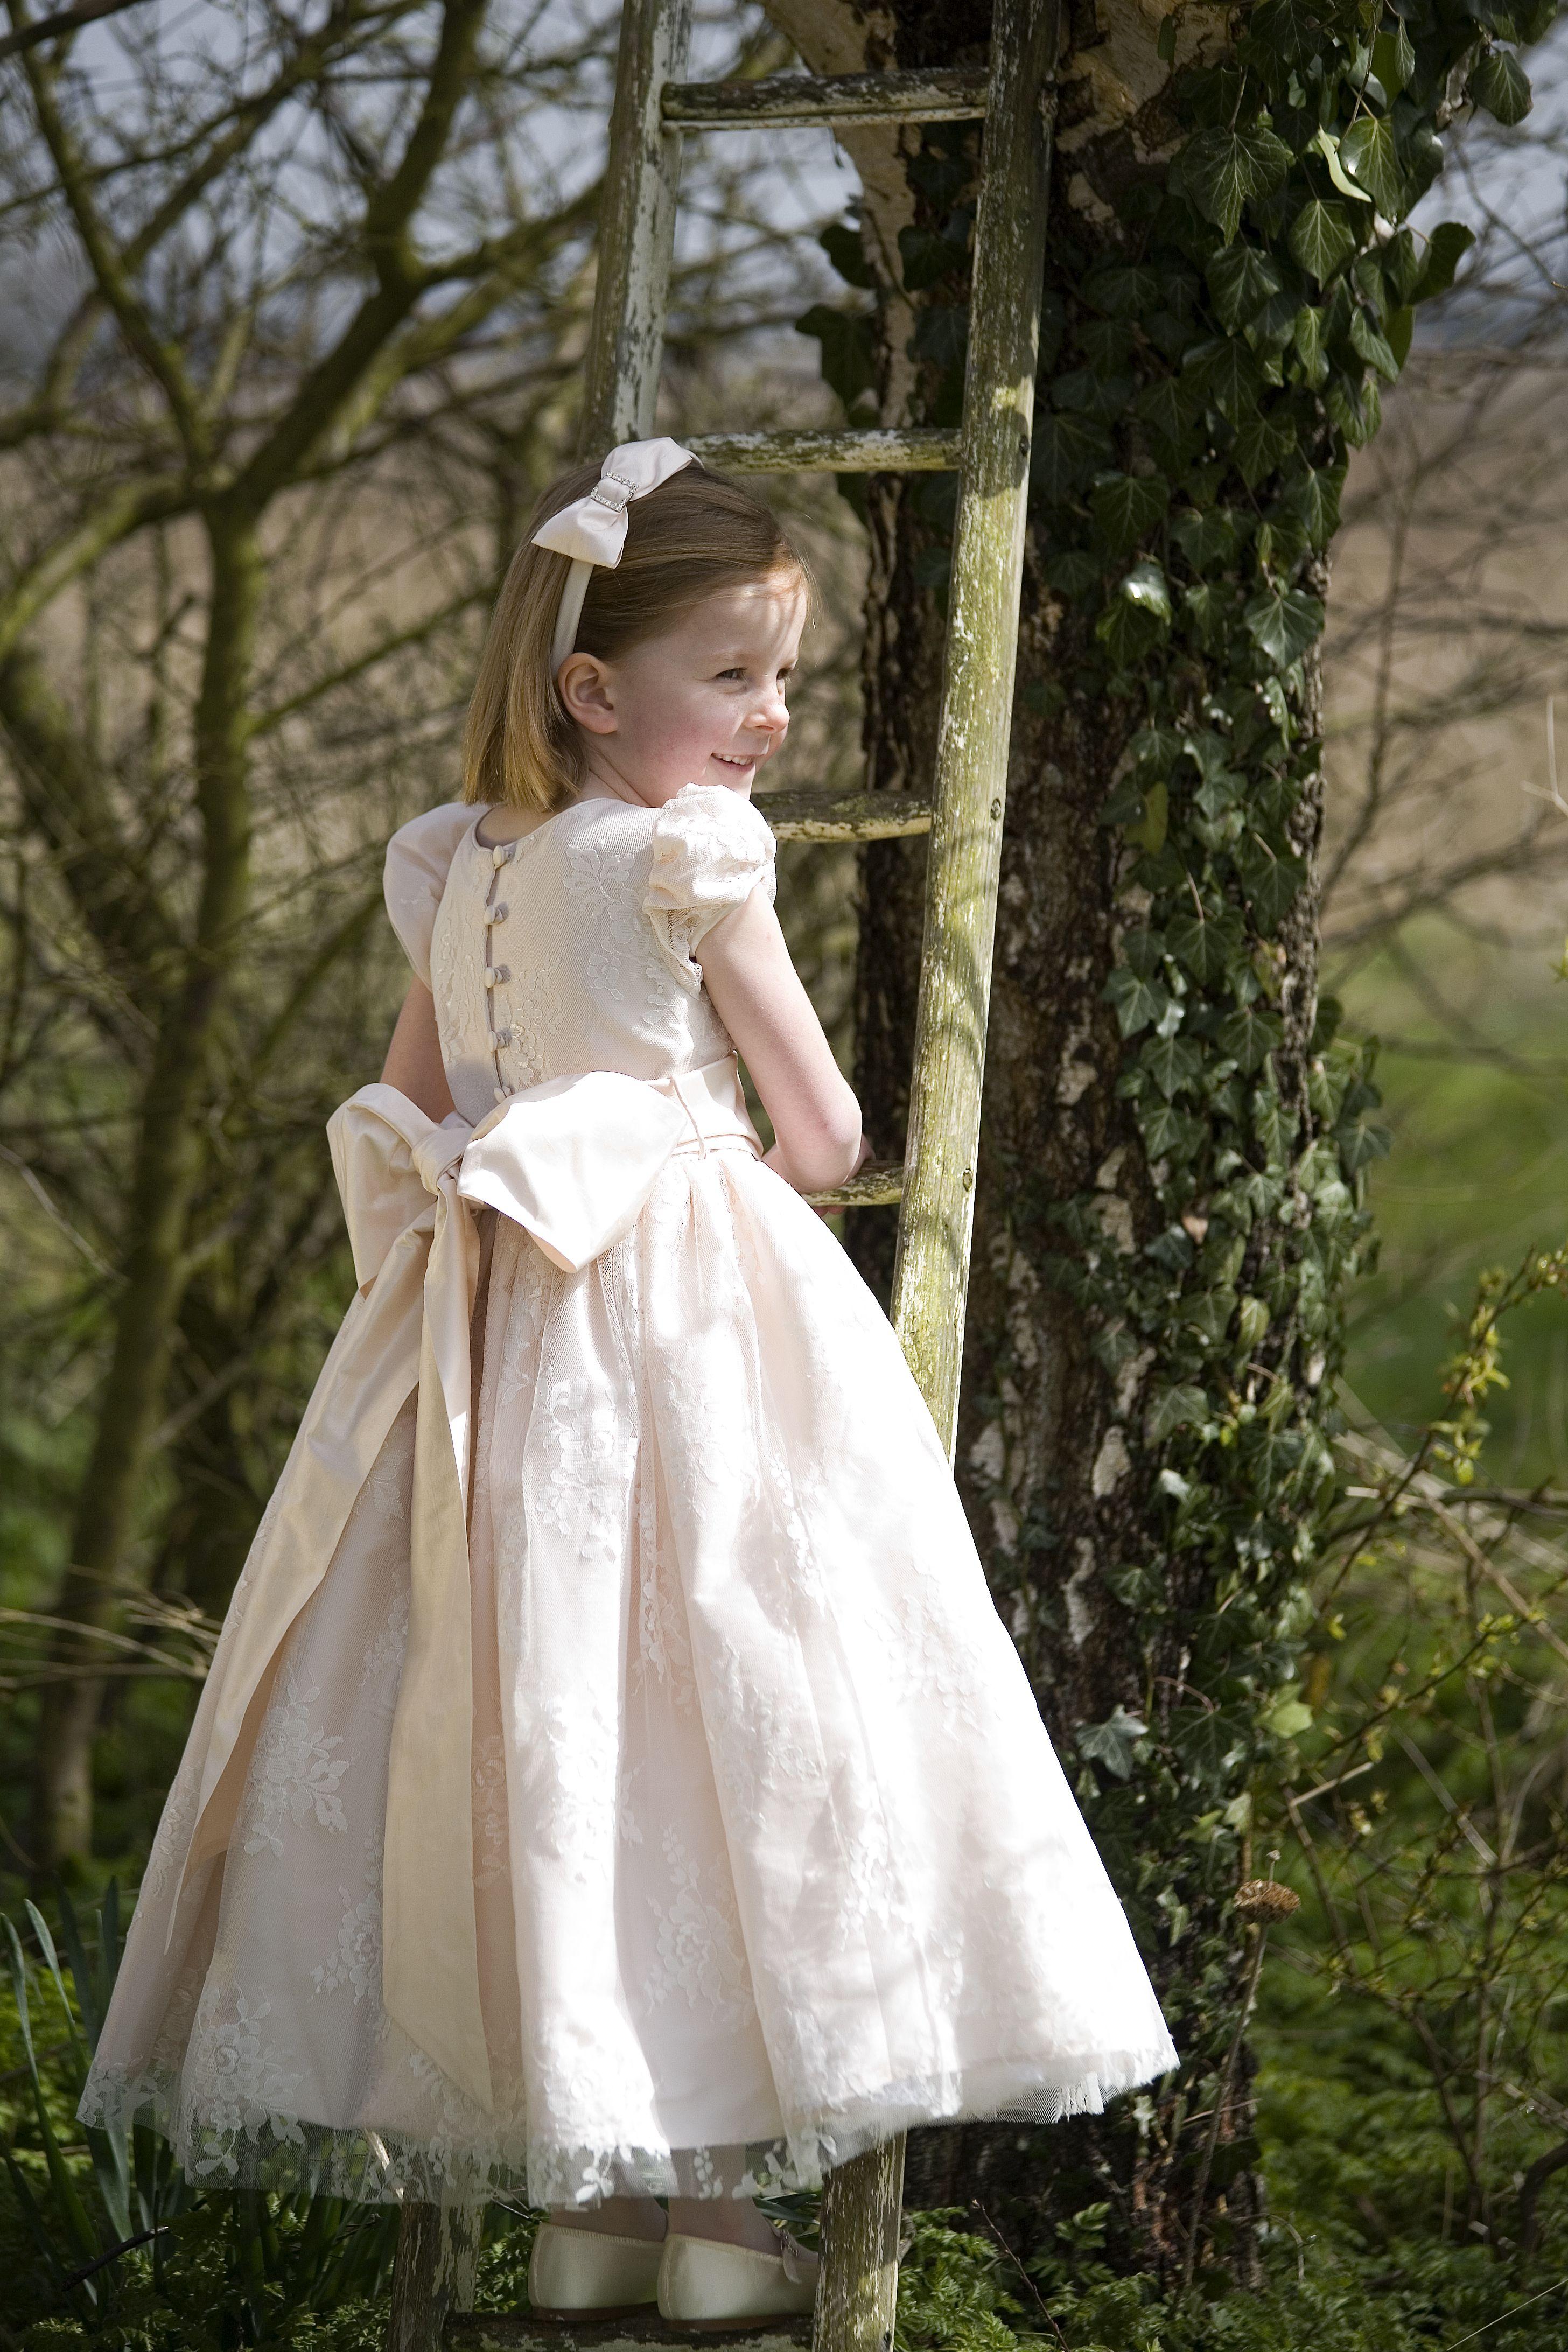 Nicki macfarlane wedding dress pinterest page boy style